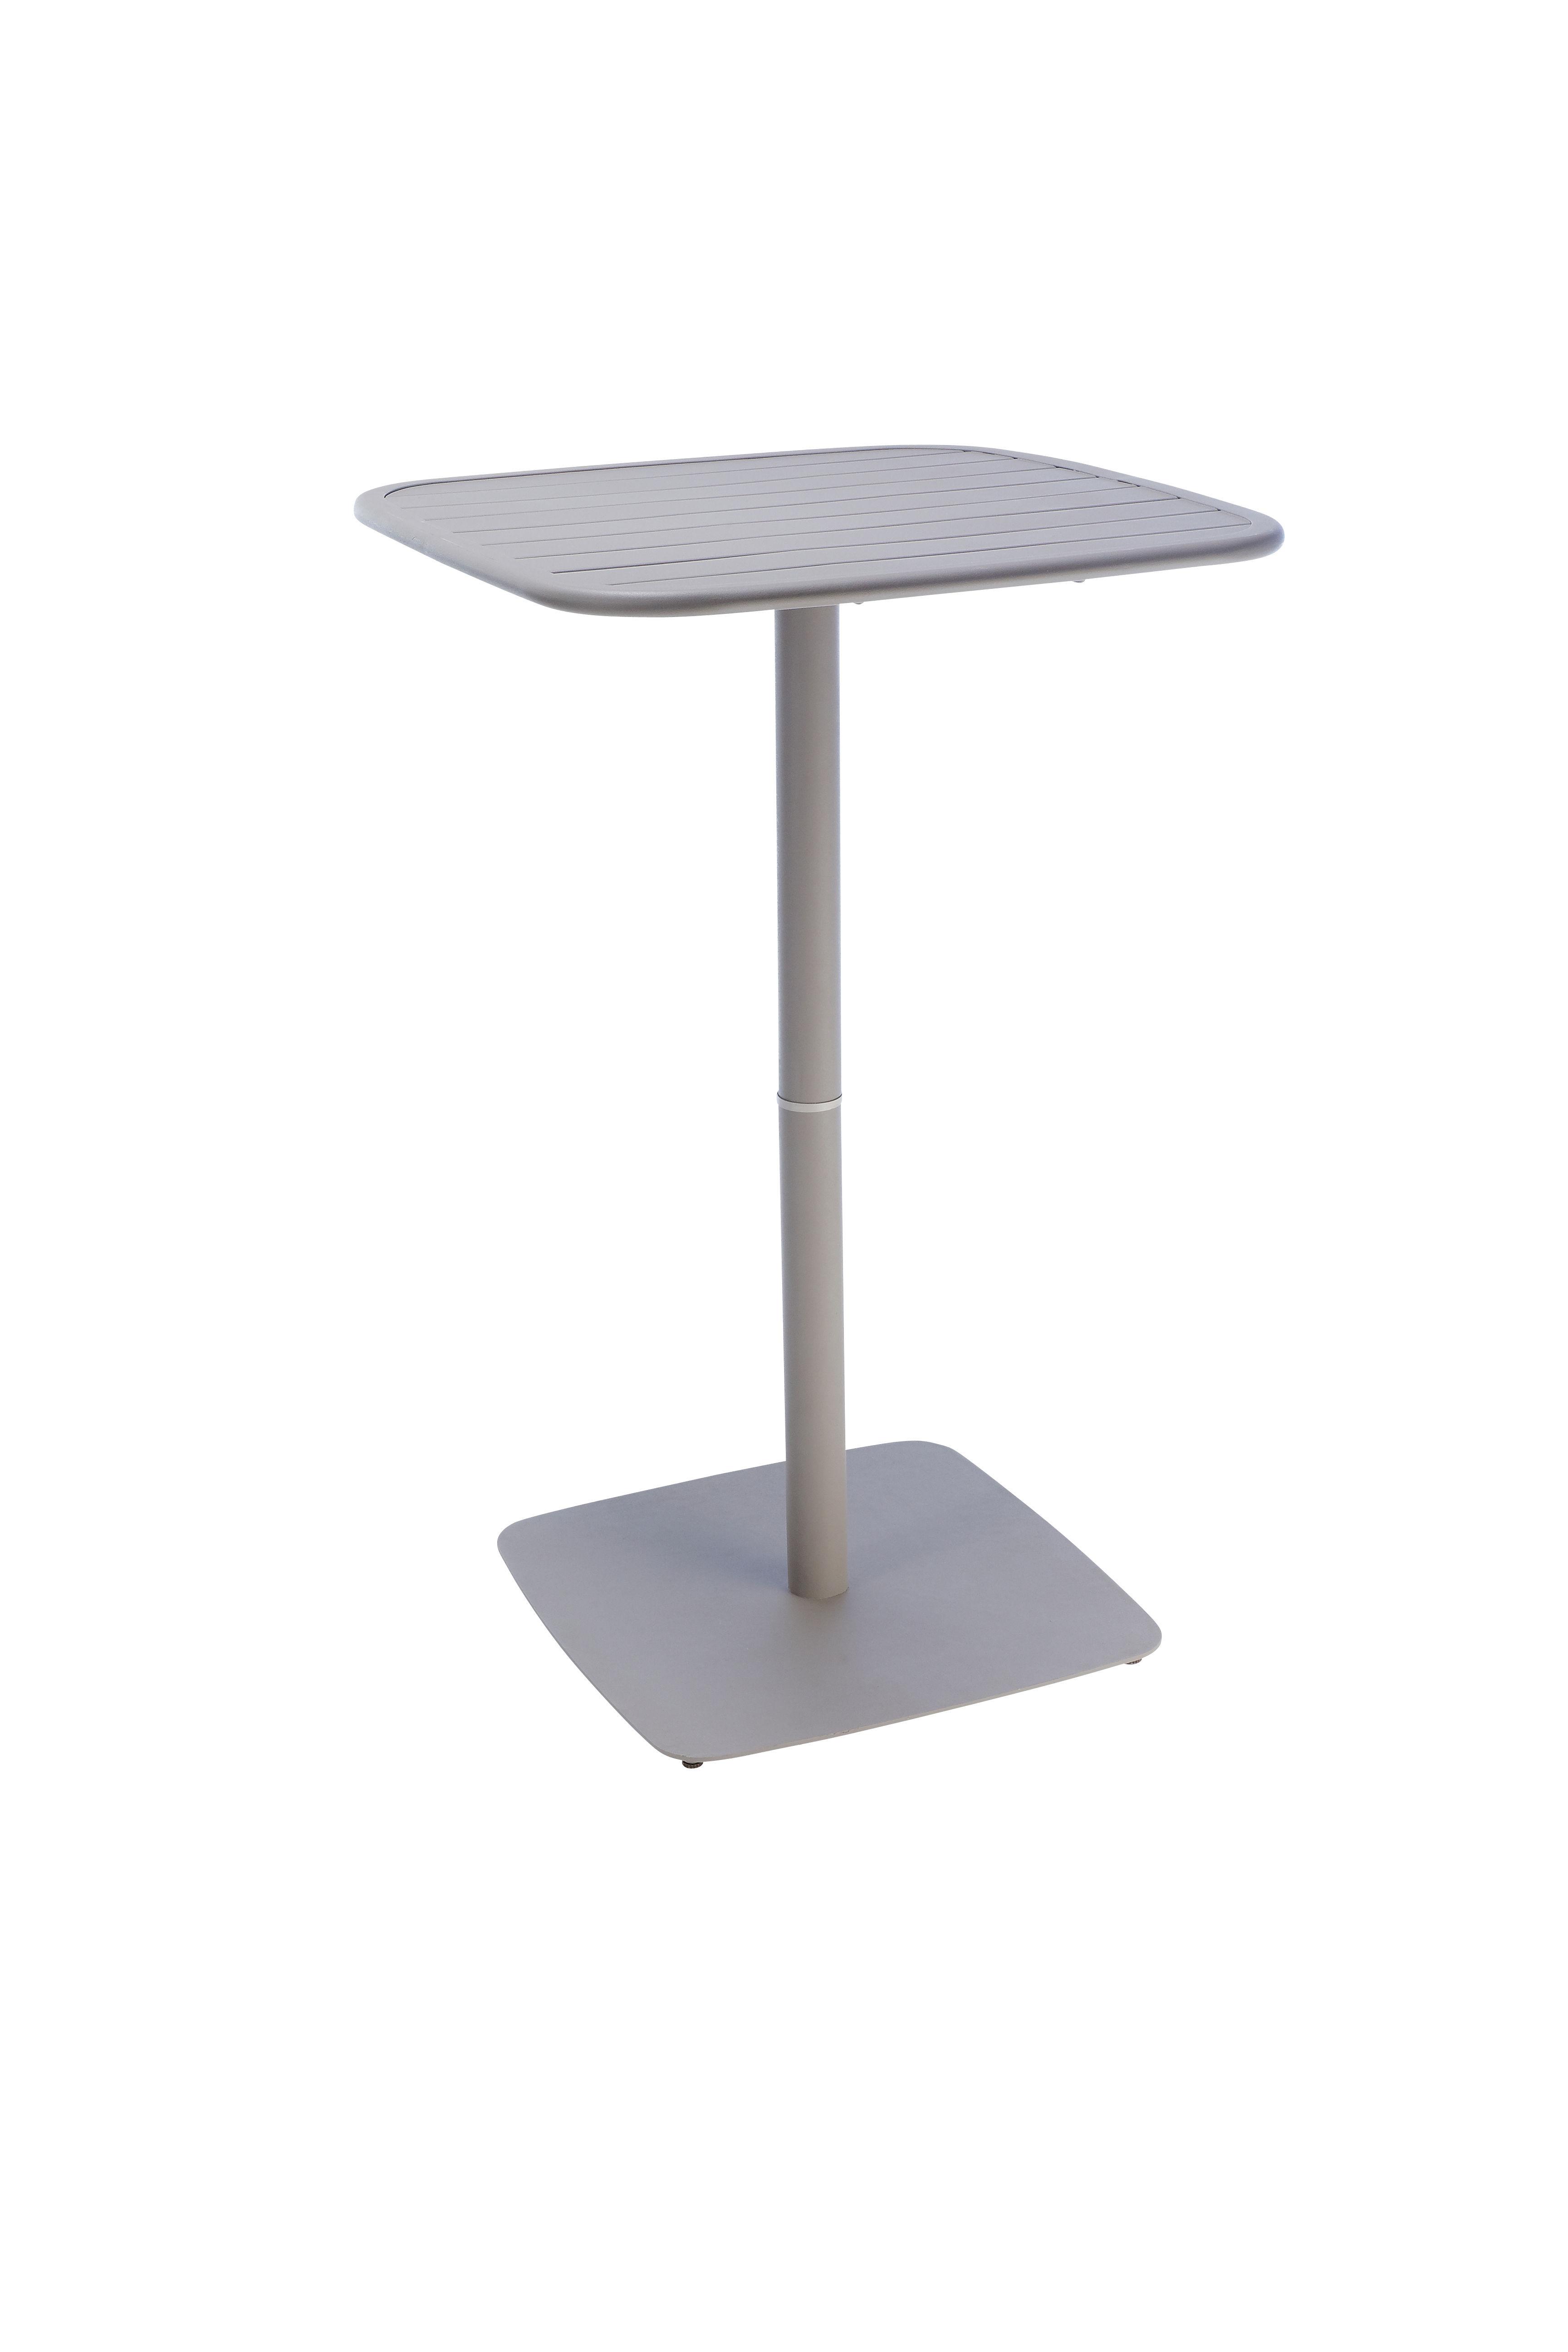 OPTIMISTIC - Table bar Acier151 taupe